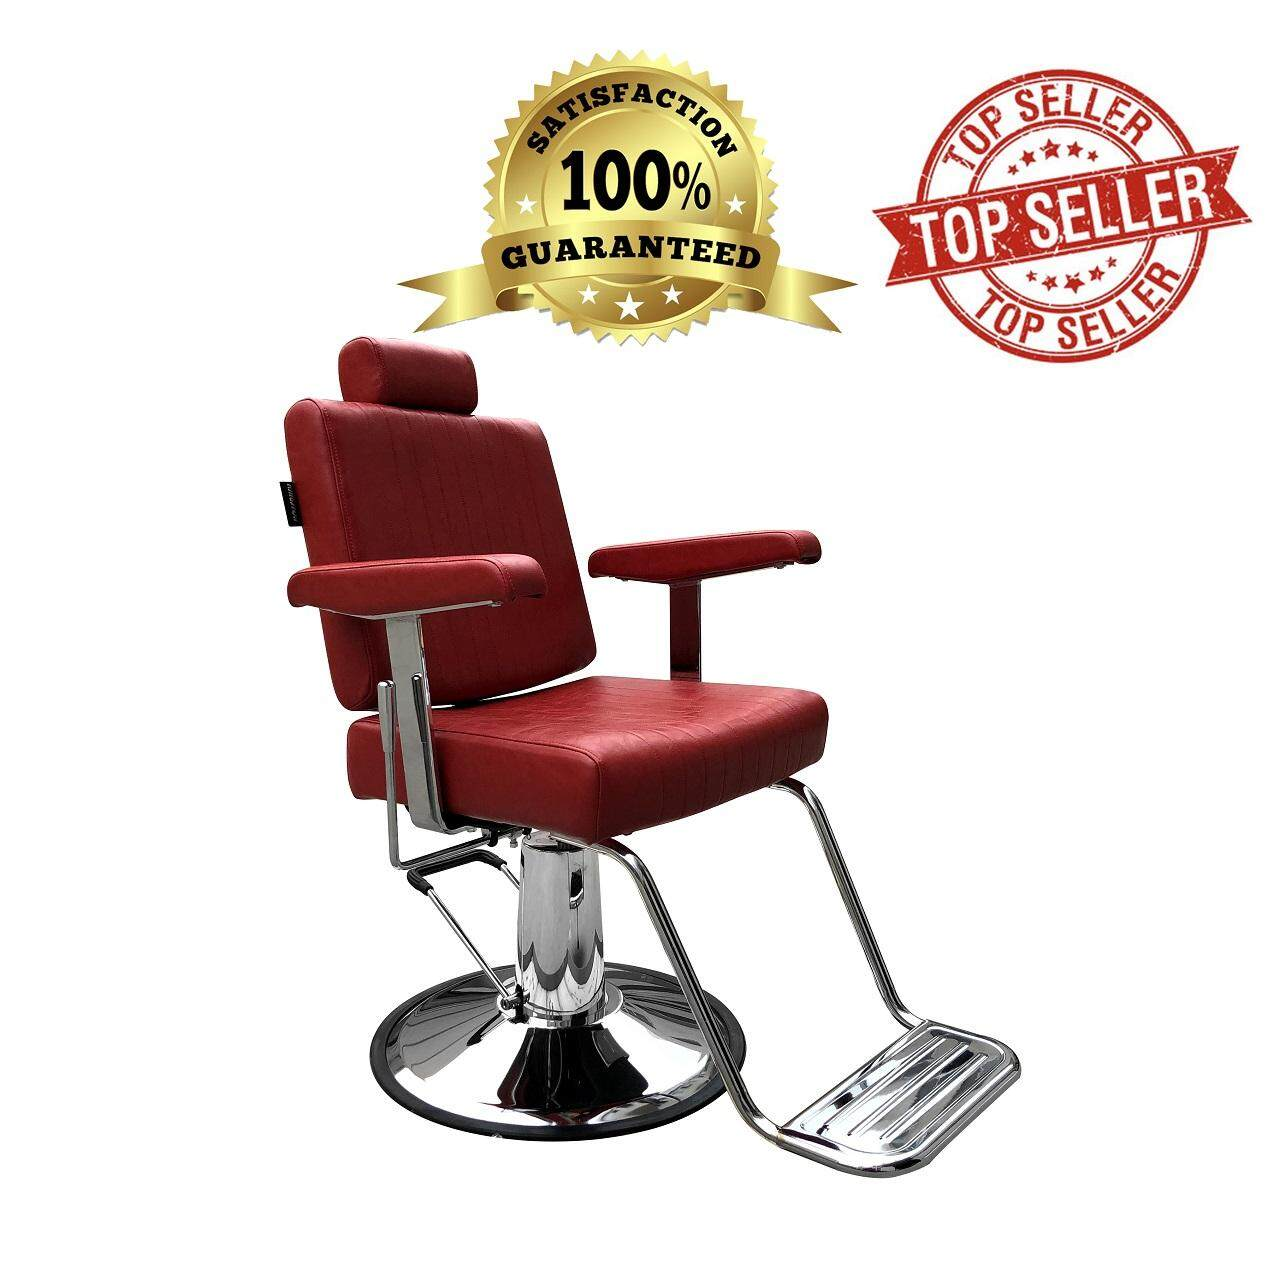 Kingston Barber Chair 380D-II